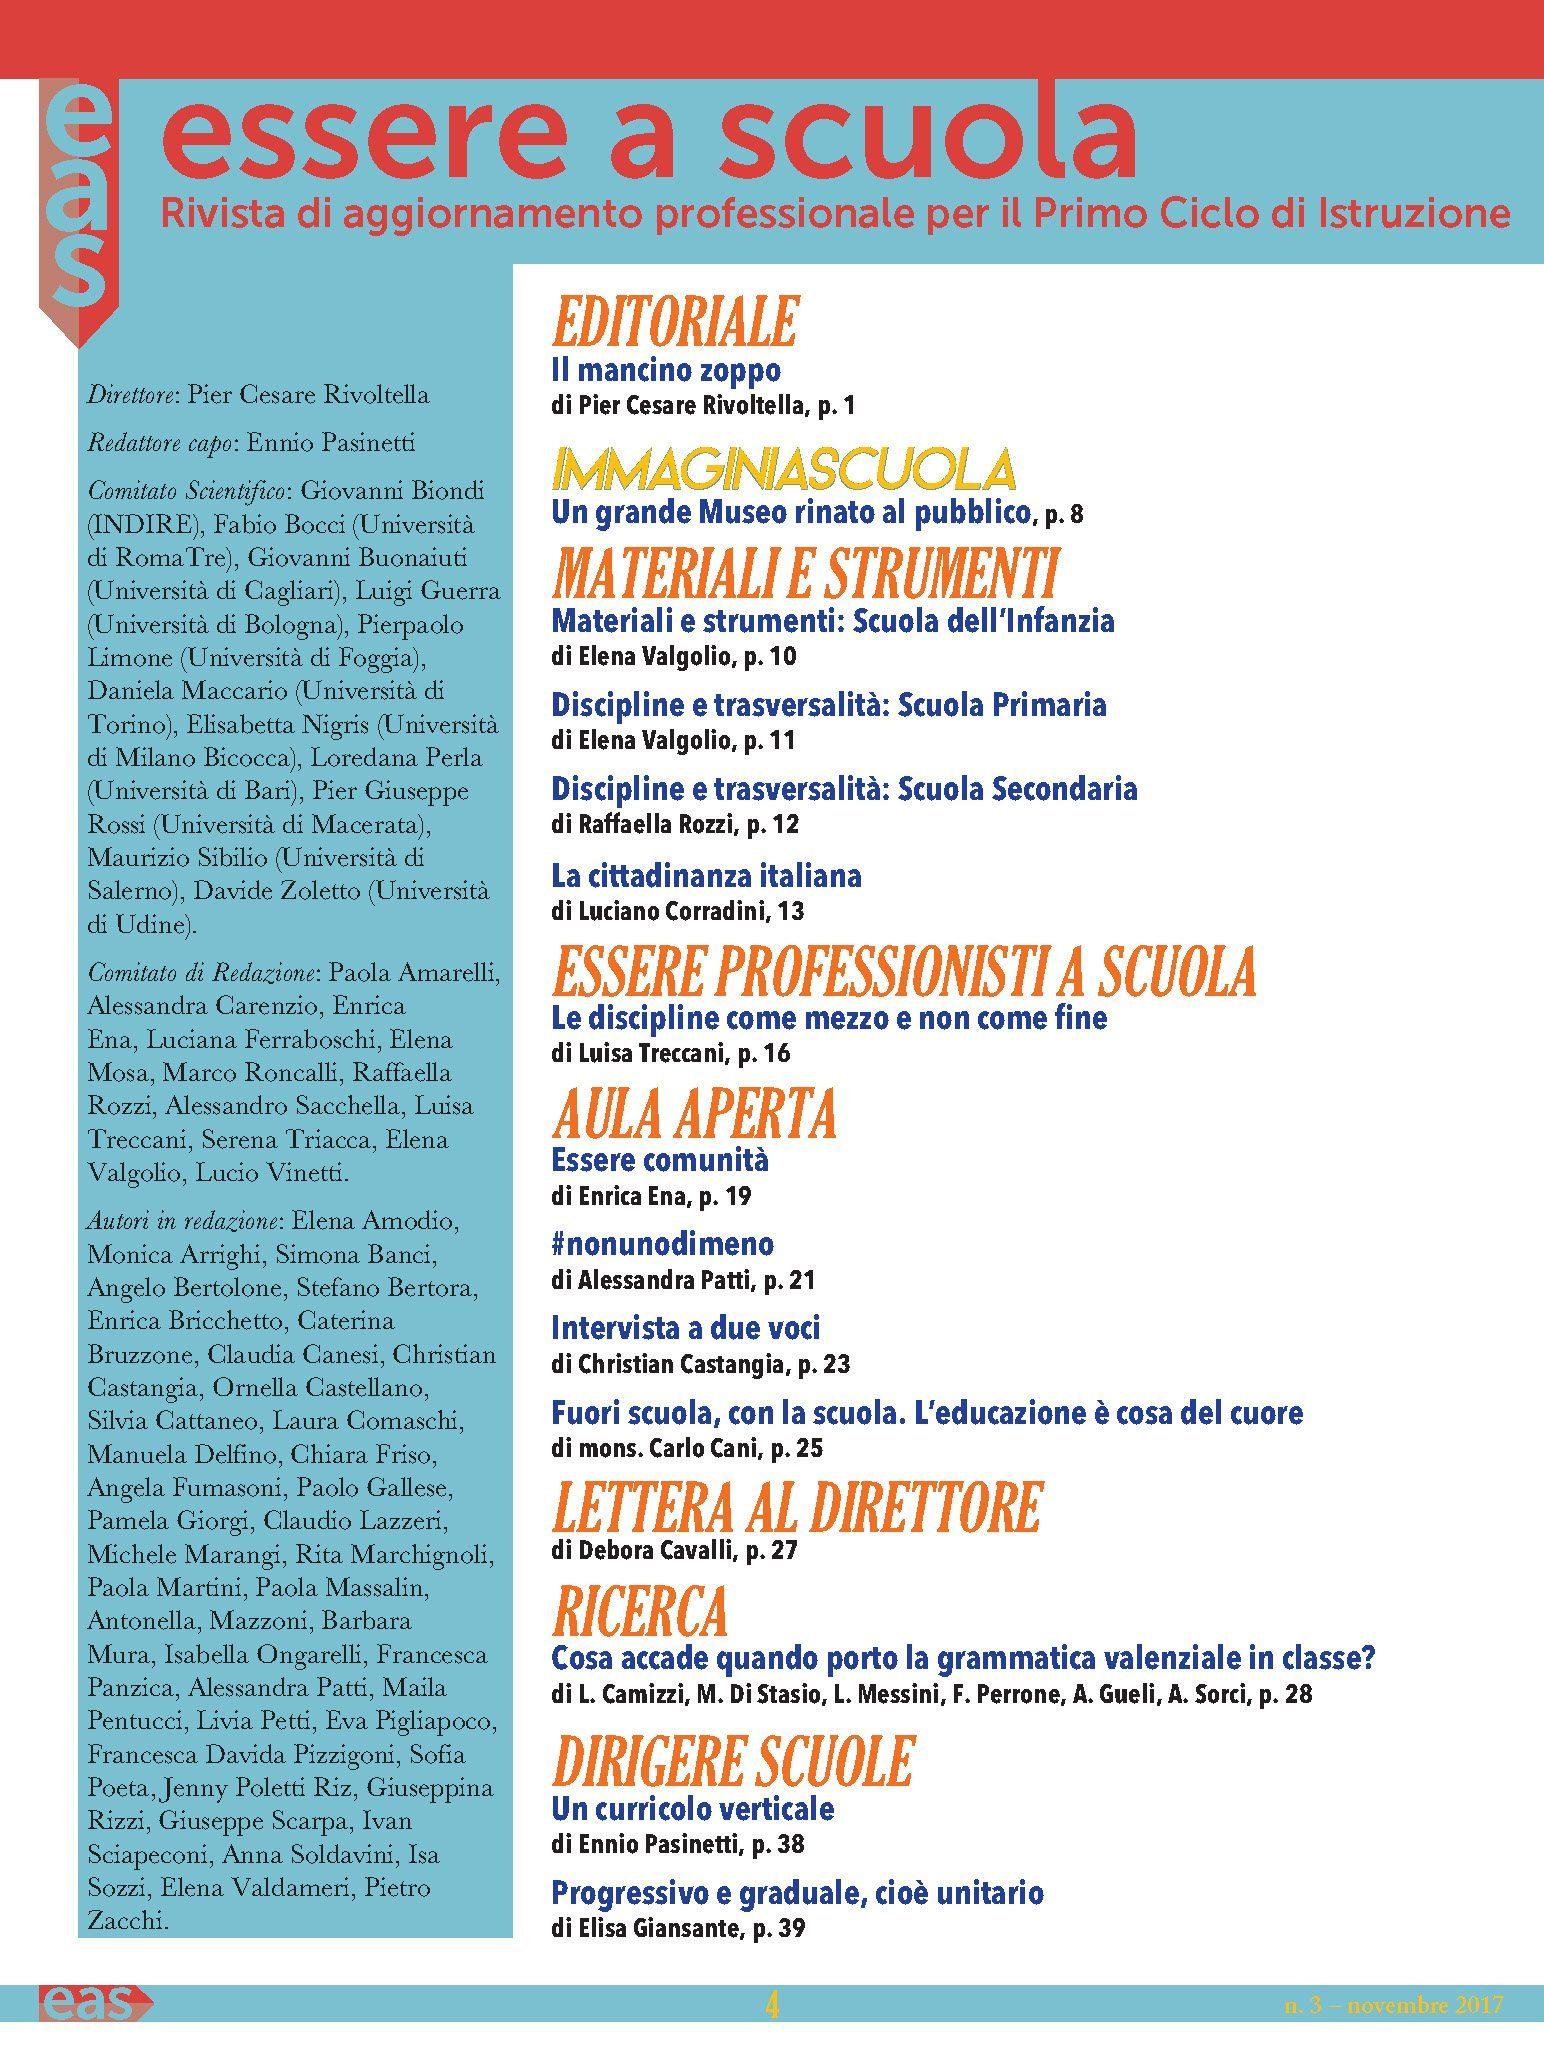 Sommario EAS 3 2017_Pagina_1.jpg